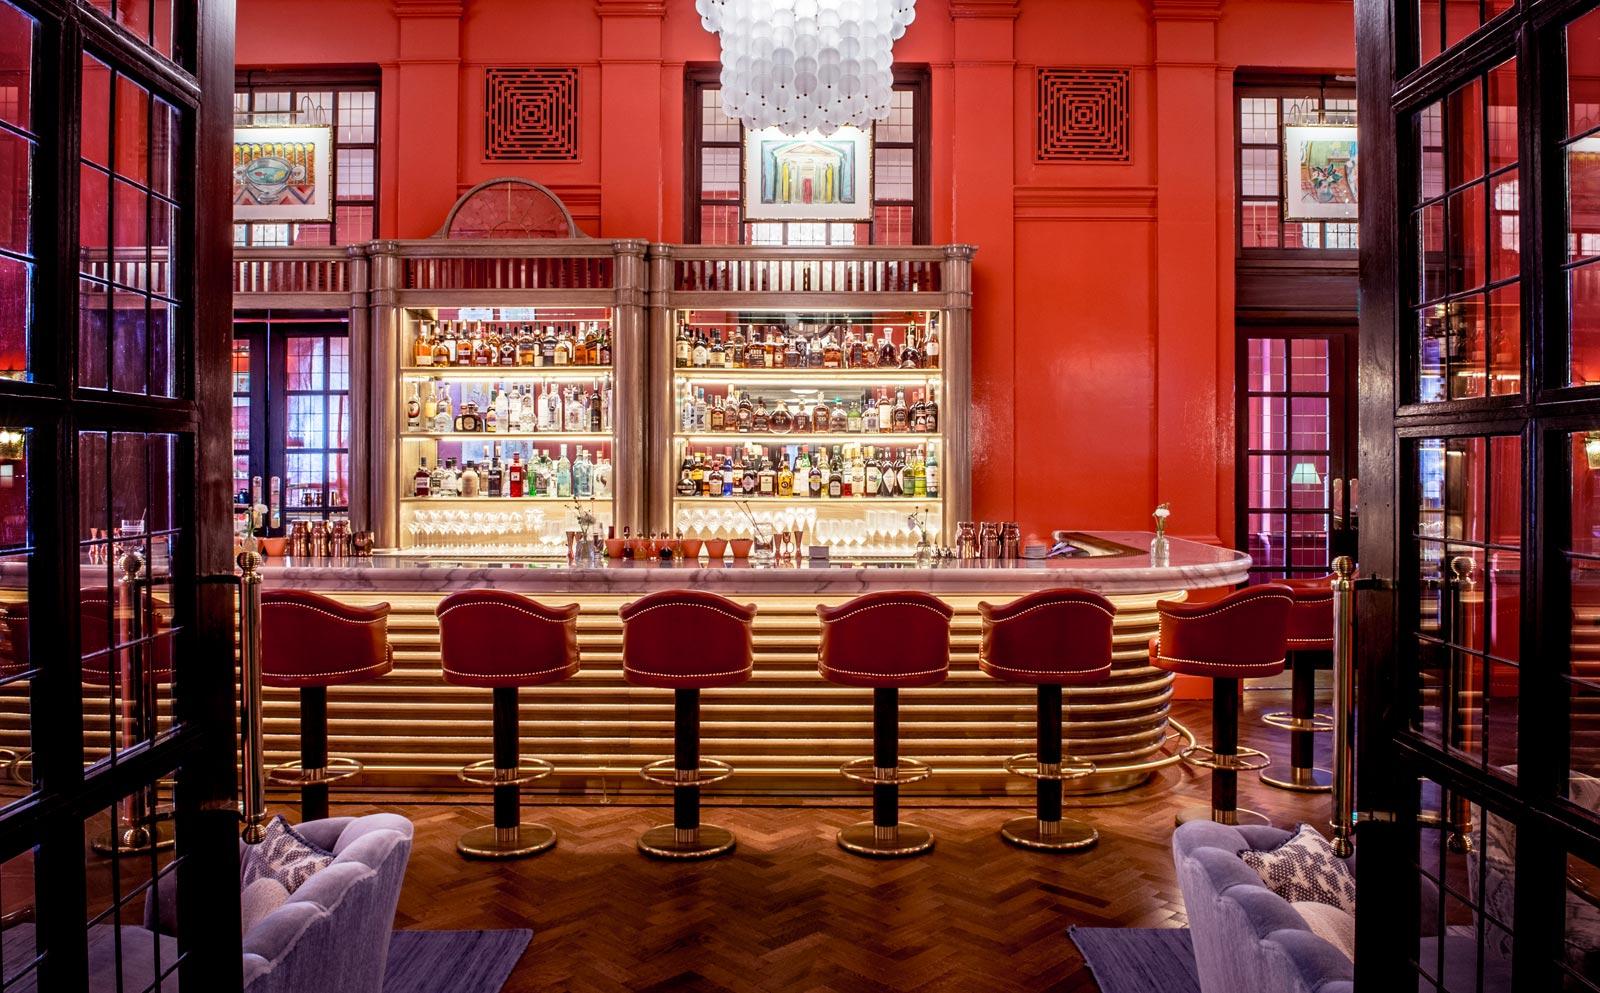 The bar at at the Coral Room and Dalloway Terrace